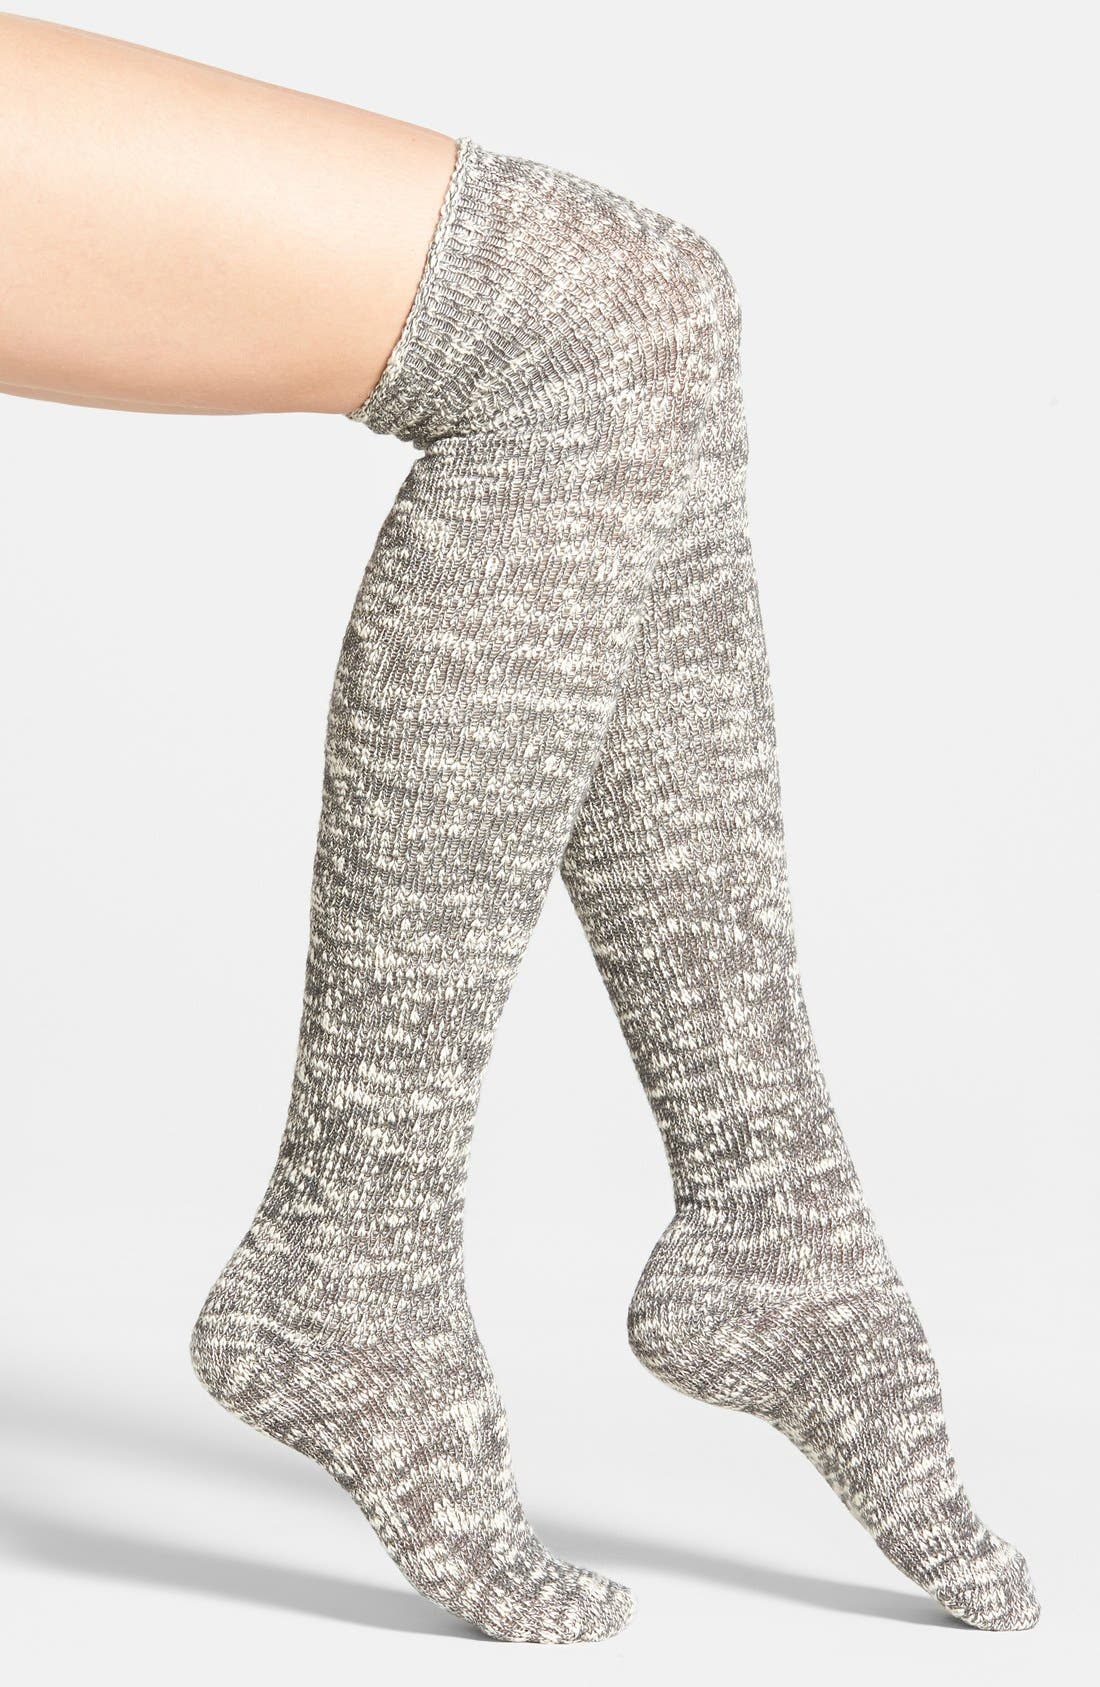 Alternate Image 1 Selected - Nordstrom Slub Knit Over the Knee Socks